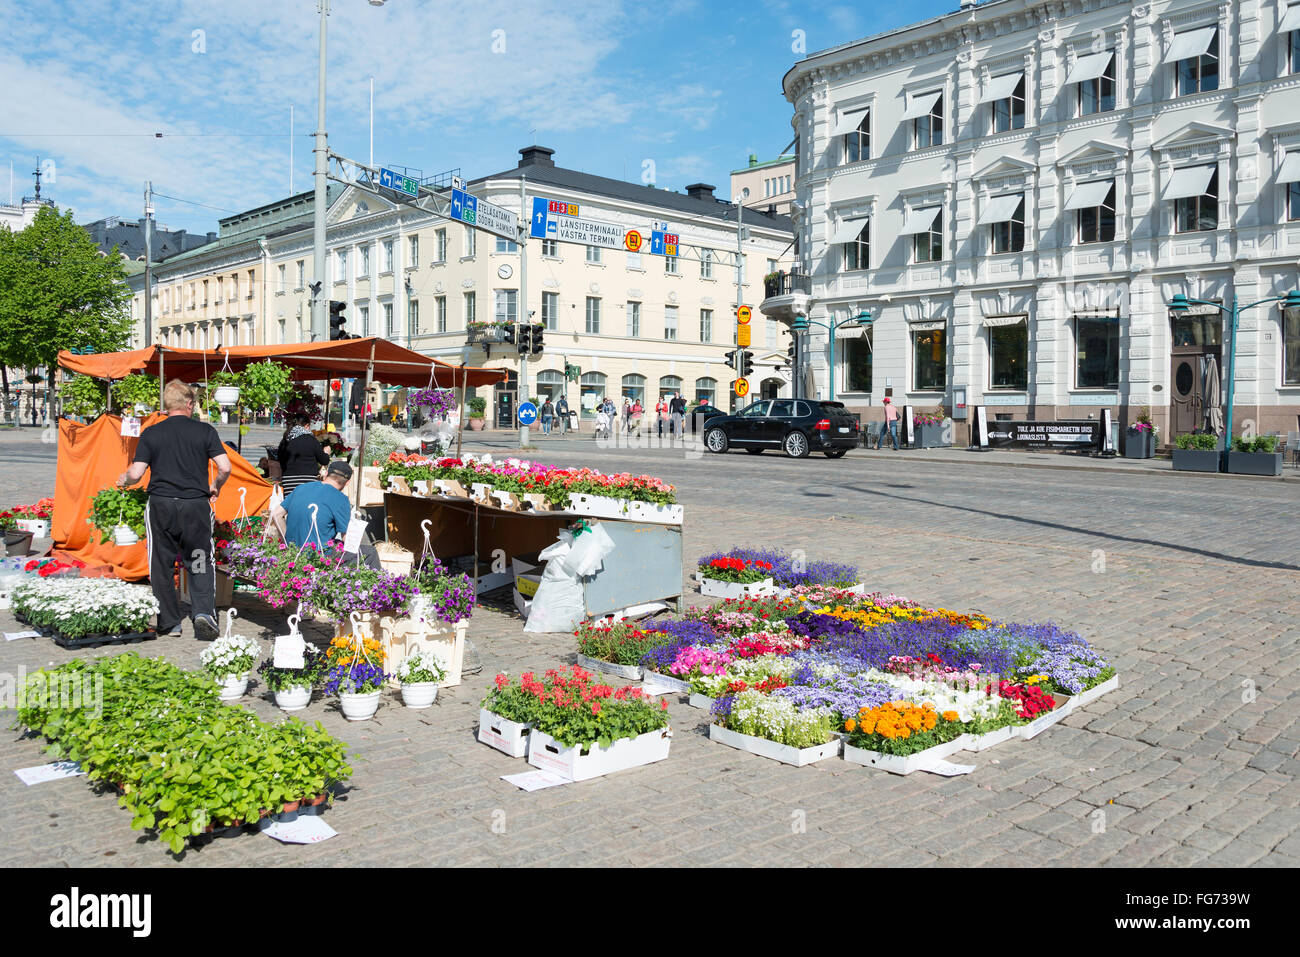 Flower stall, Kauppatori Market Square, Helsinki, Uusimaa Region, Republic of Finland - Stock Image